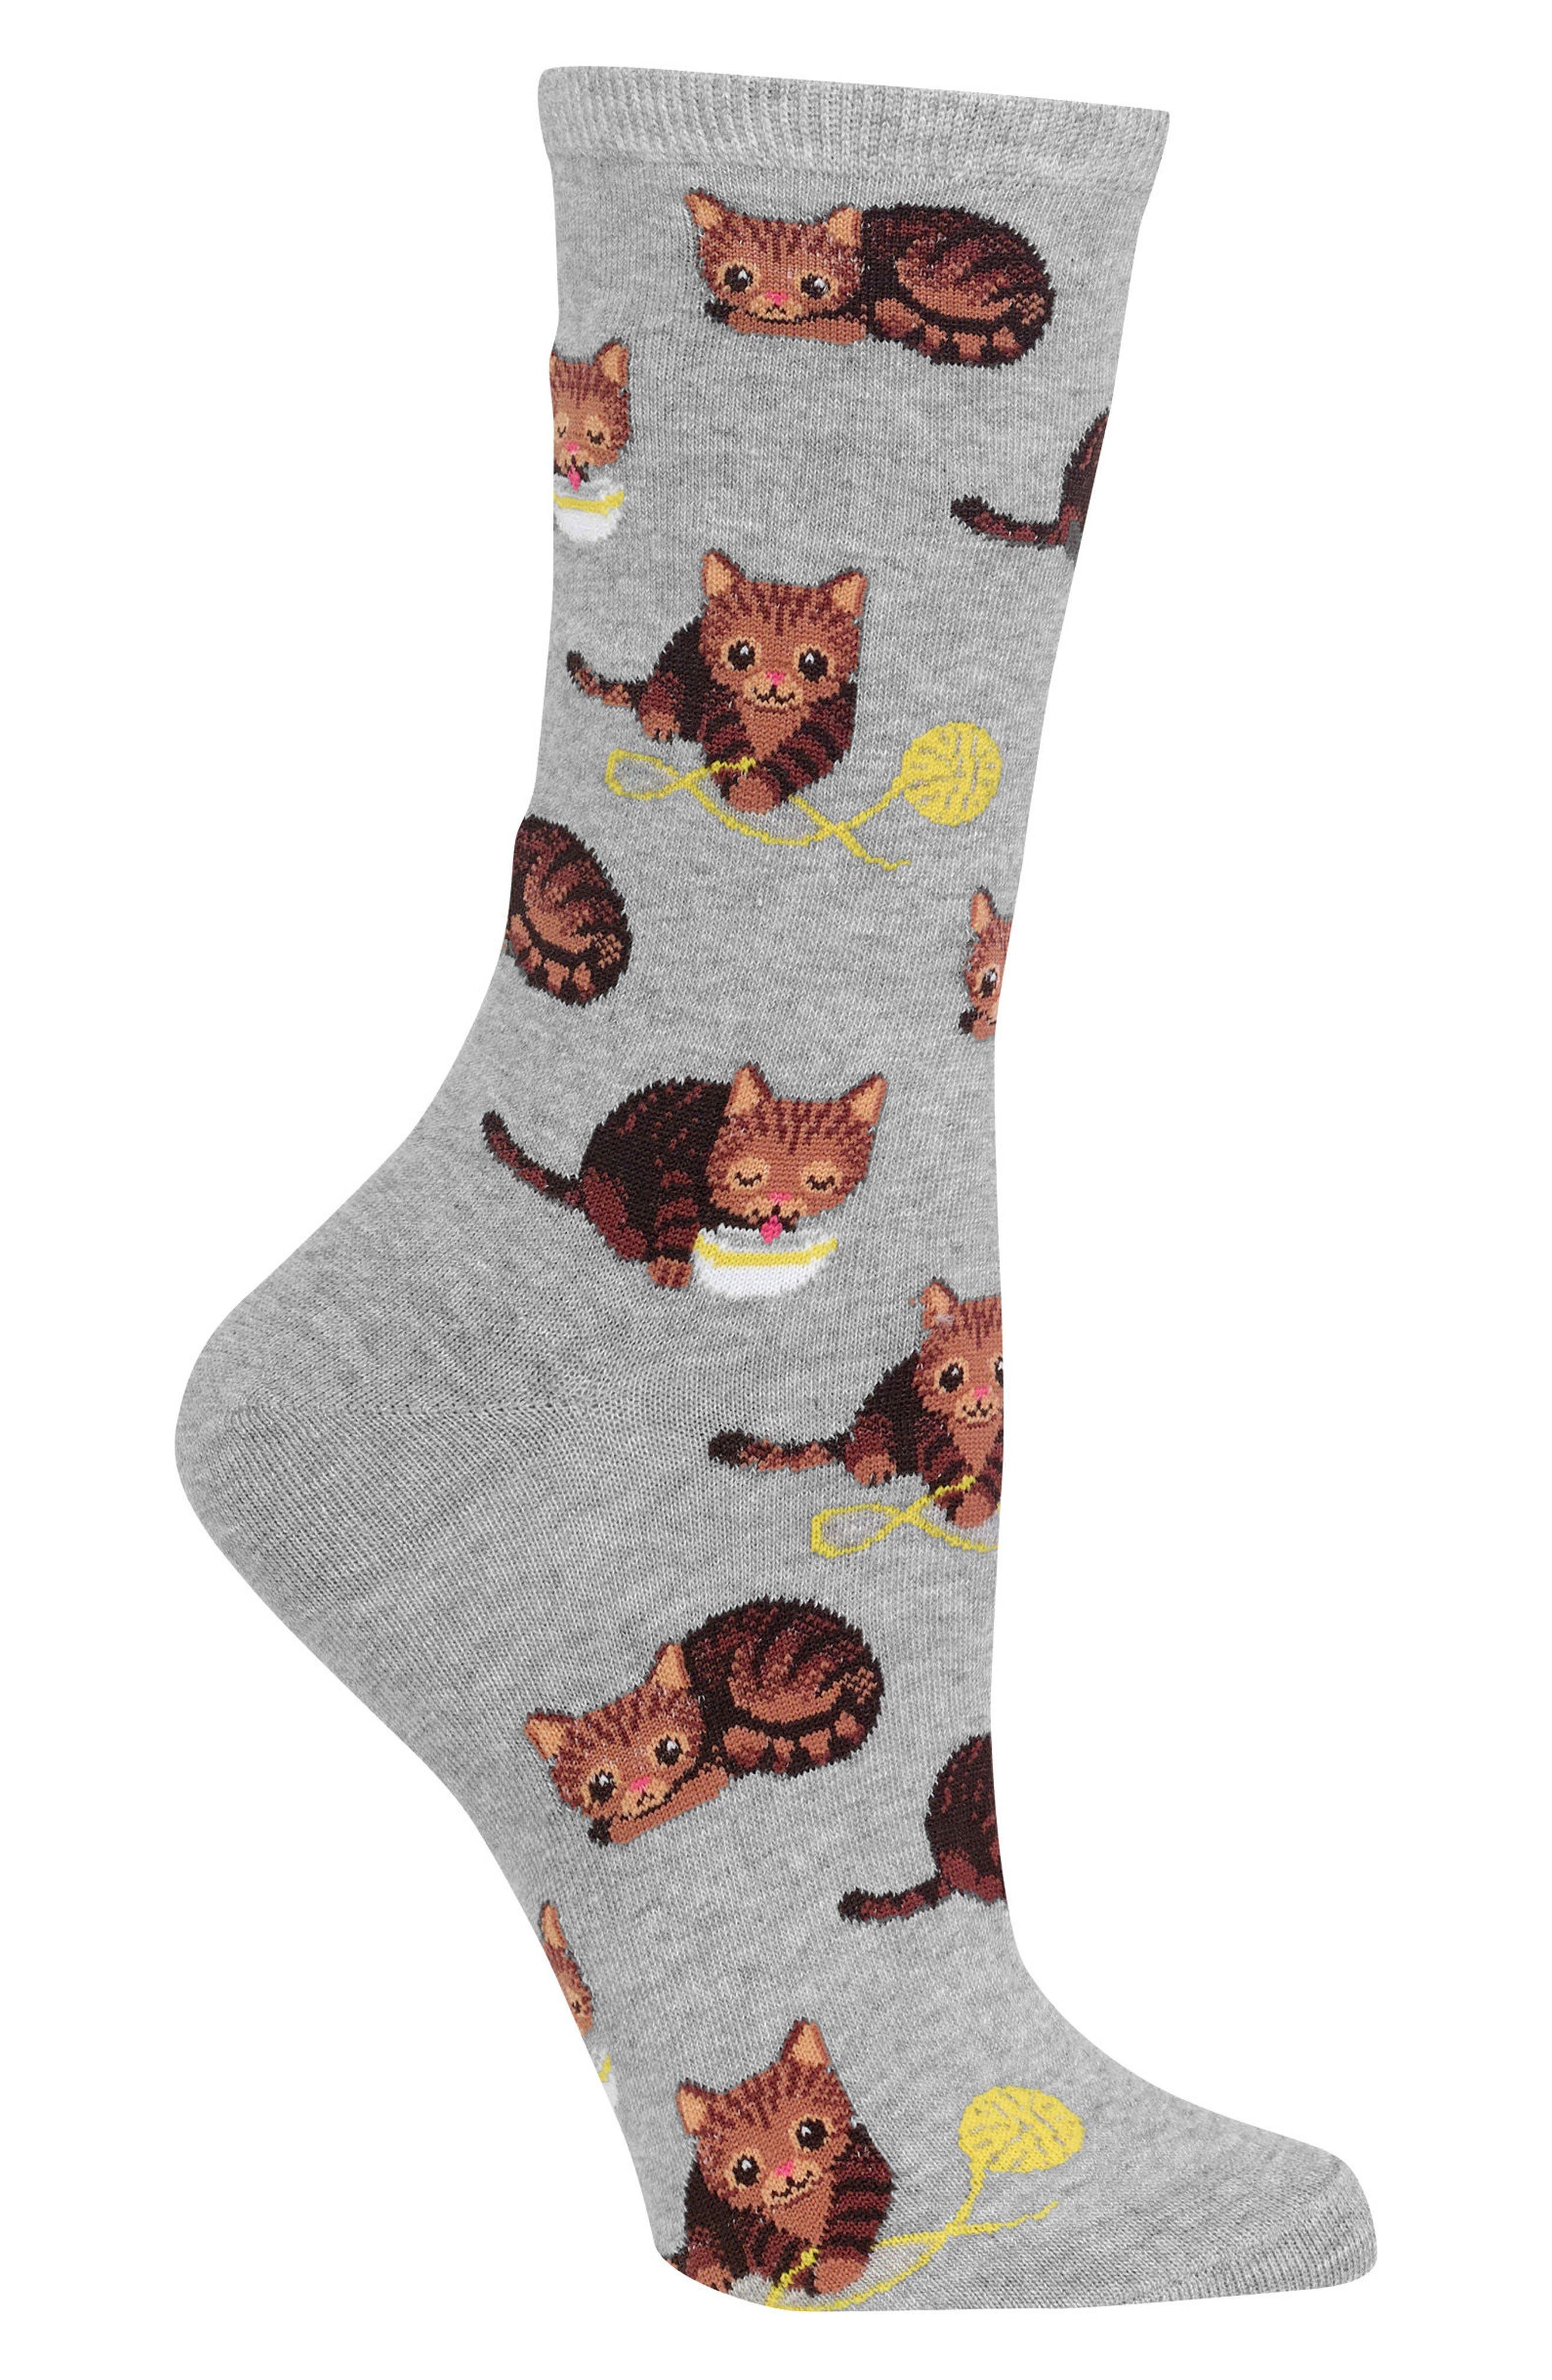 Cat & Yarn Crew Socks,                             Alternate thumbnail 3, color,